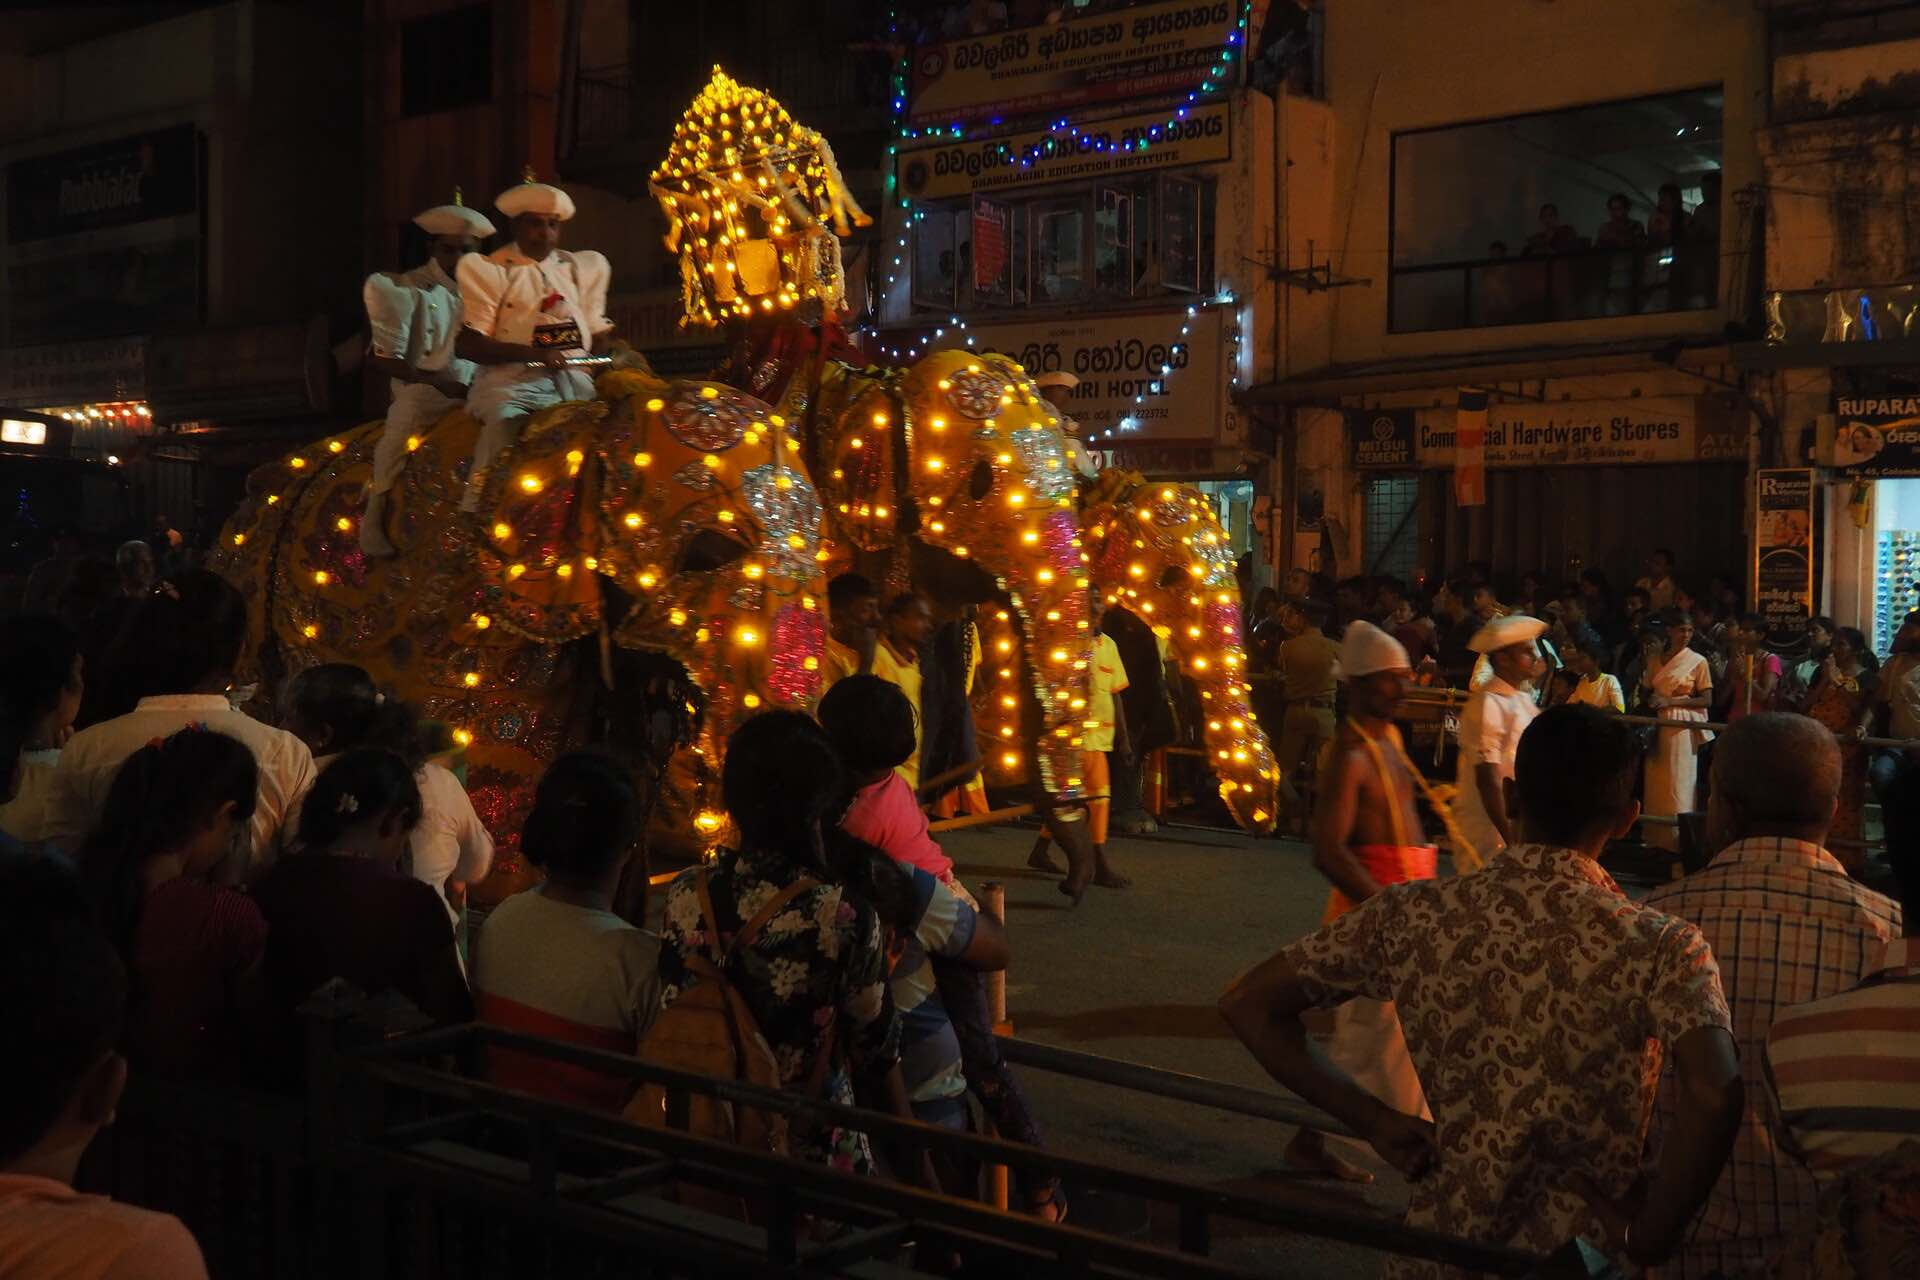 sri-lanka-kandy-perahera-elephant-festival-holiday-review-feedback-invite-to-paradise-quentin-kate-hulm.jpg